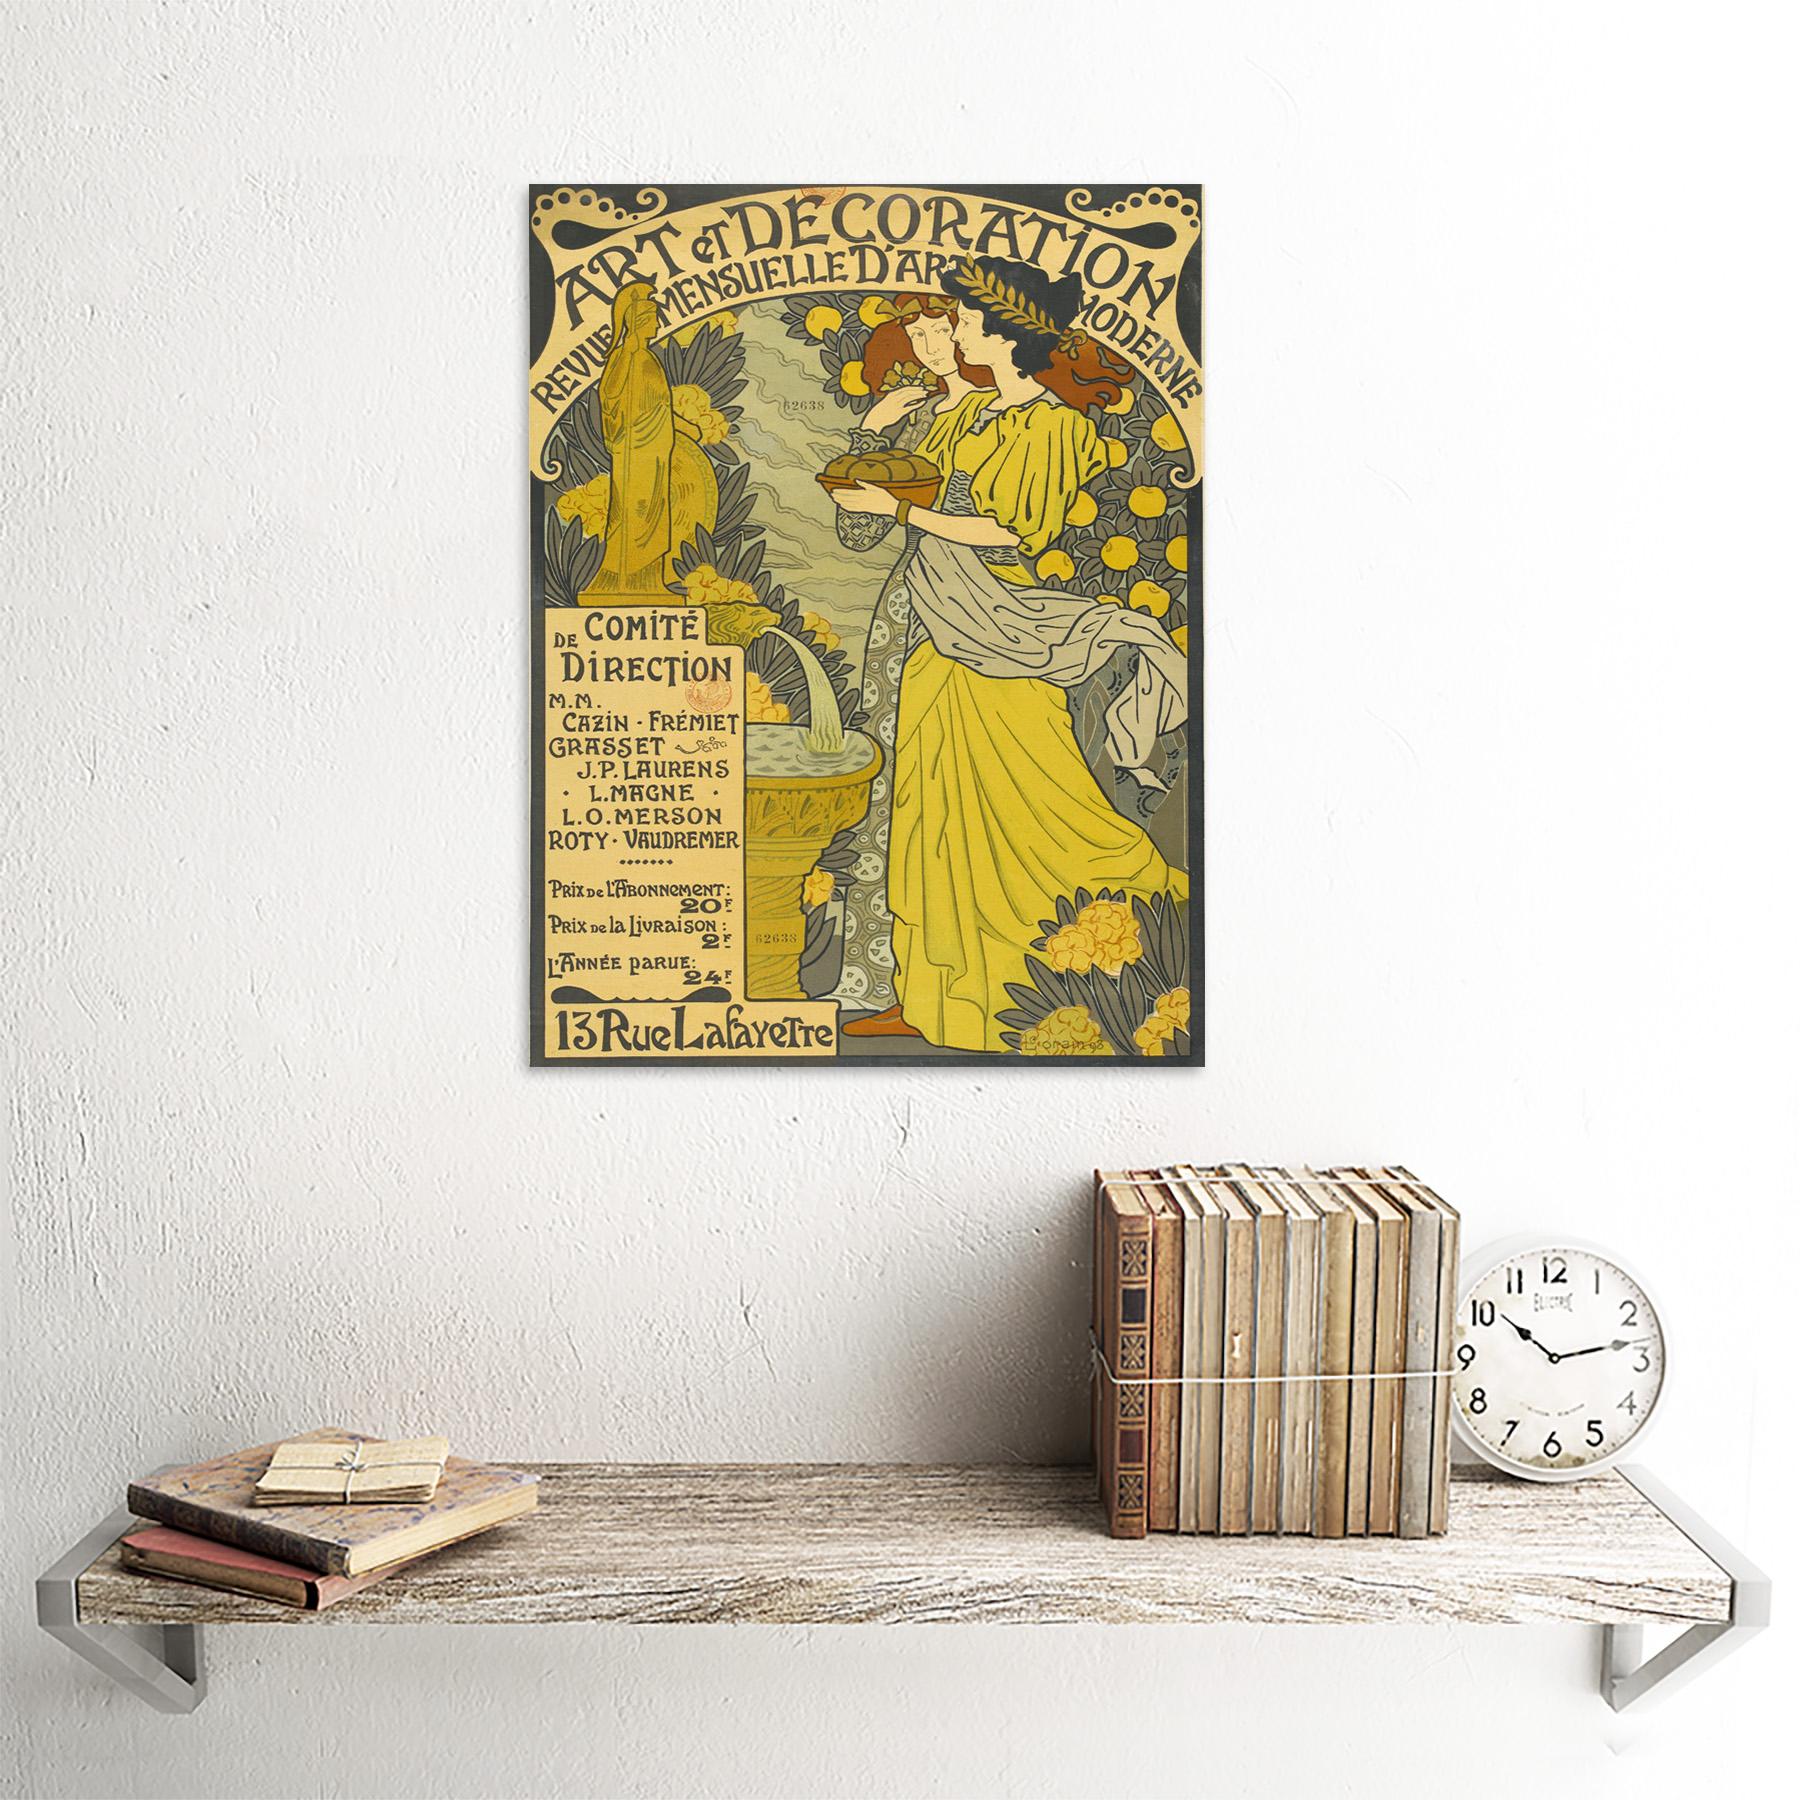 Lorain-Decoration-Magazine-Nouveau-French-Advert-Framed-Wall-Art-Poster thumbnail 23